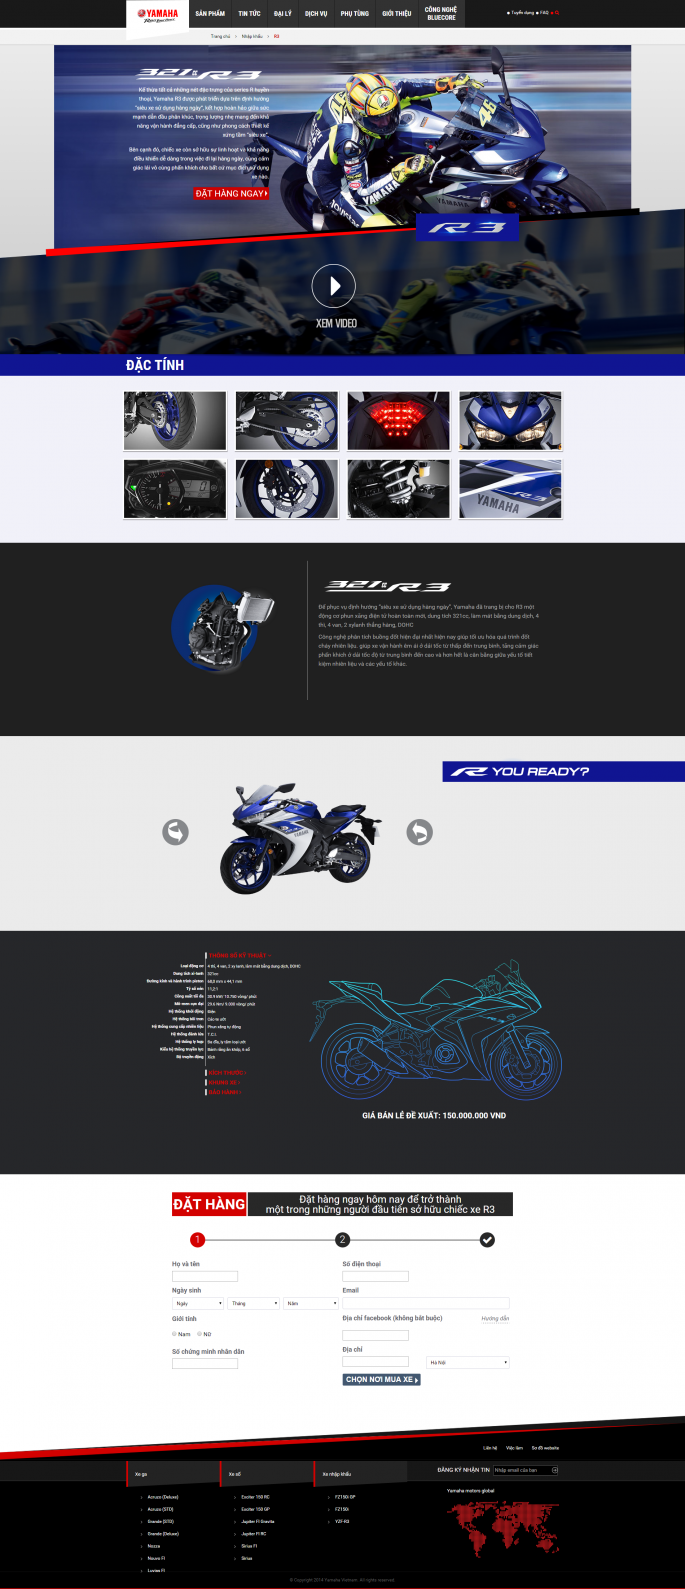 yamaha-motor.com.vn_r3